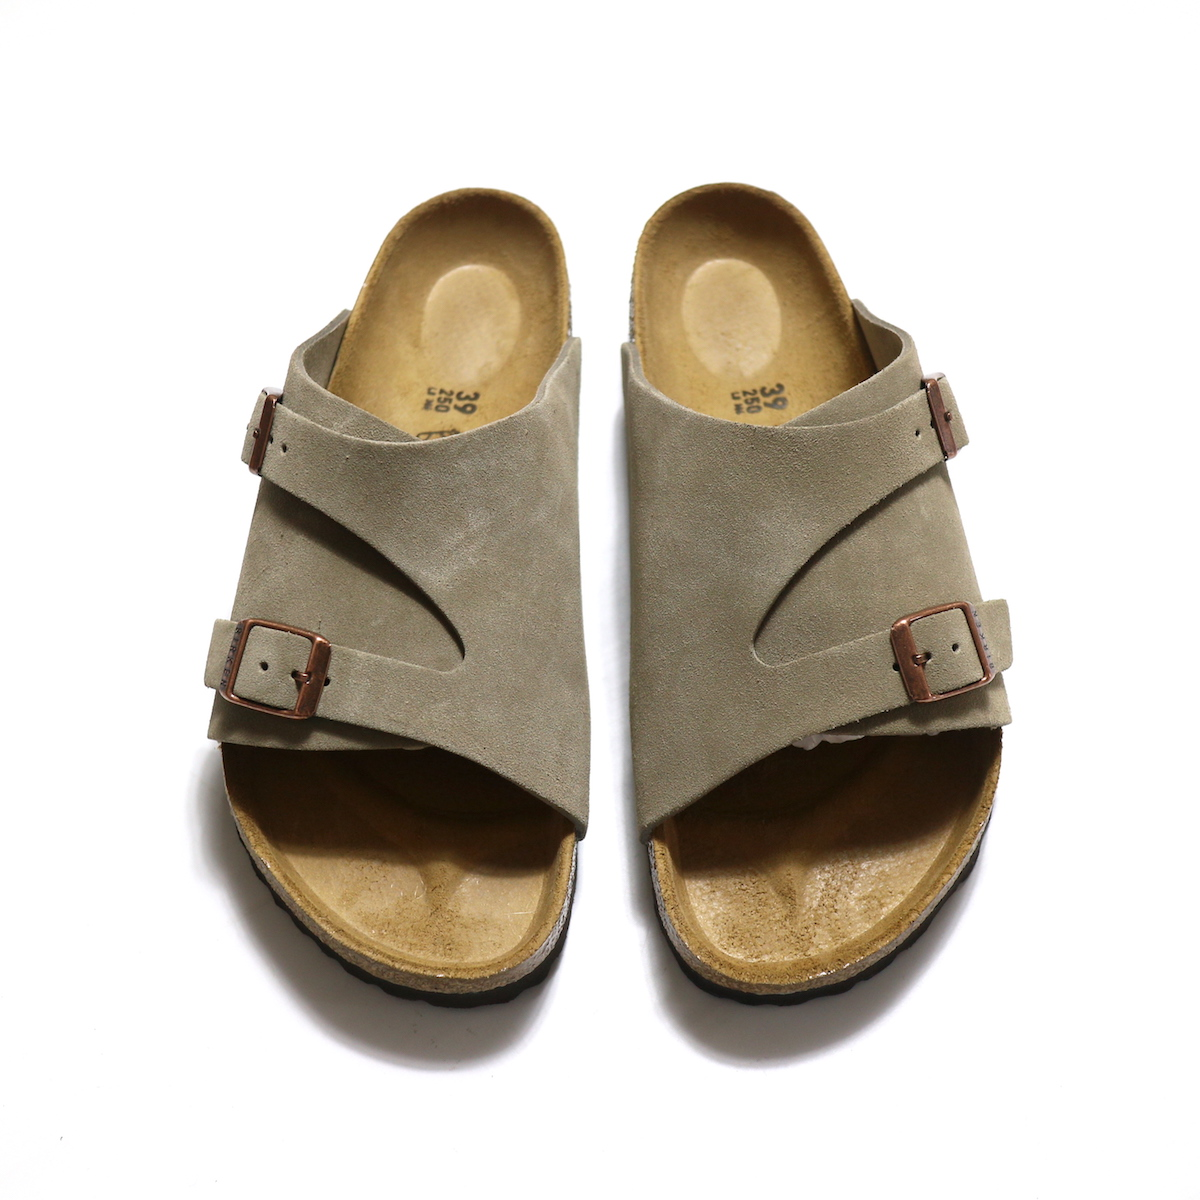 BIRKENSTOCK / Zurich Soft Footbed -Taupe 正面